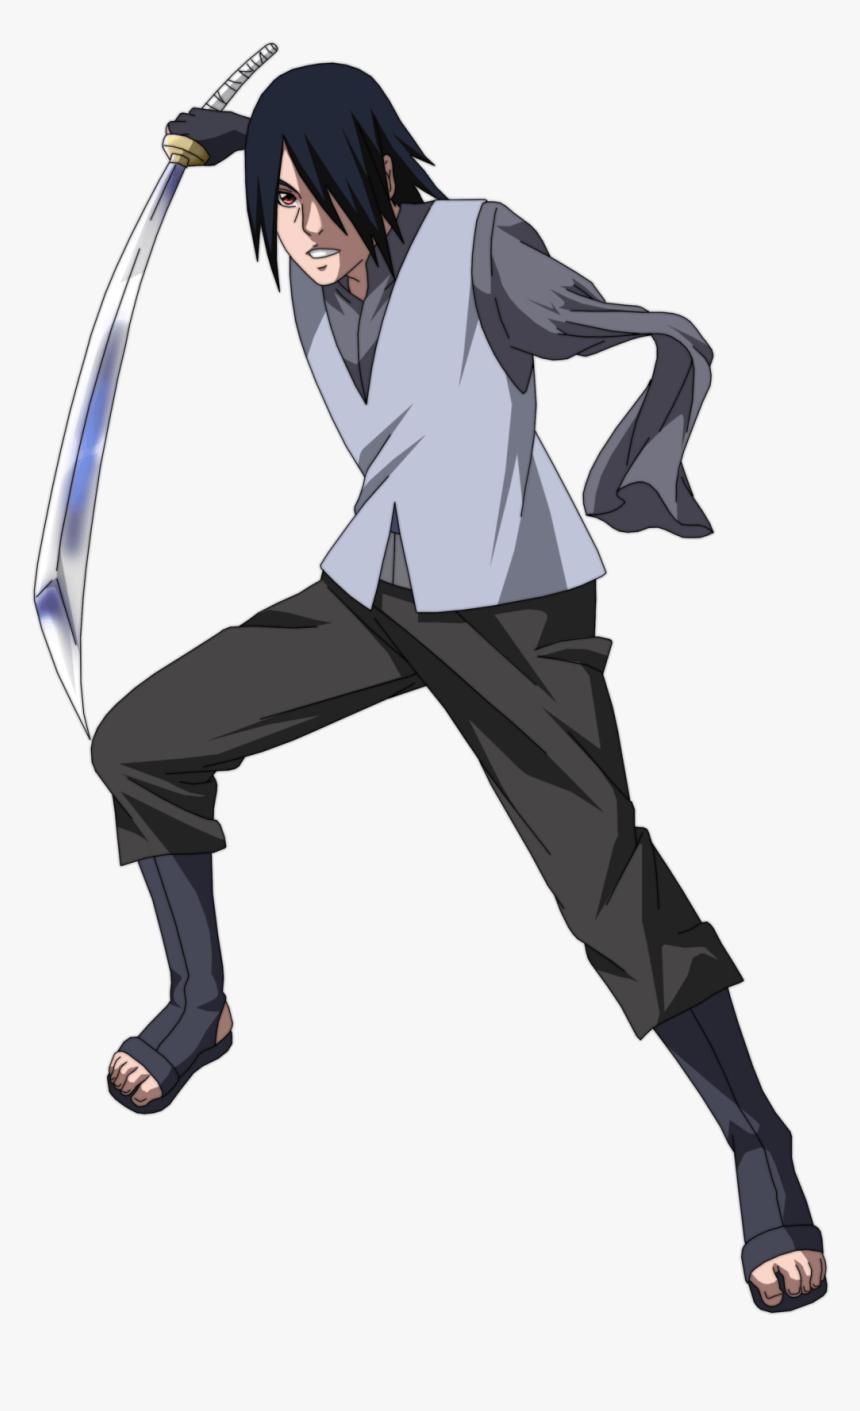 Naruto The Movie Wallpapers Data Src Full 1645600 Sasuke Uchiha Boruto Hd Png Download Transparent Png Image Pngitem